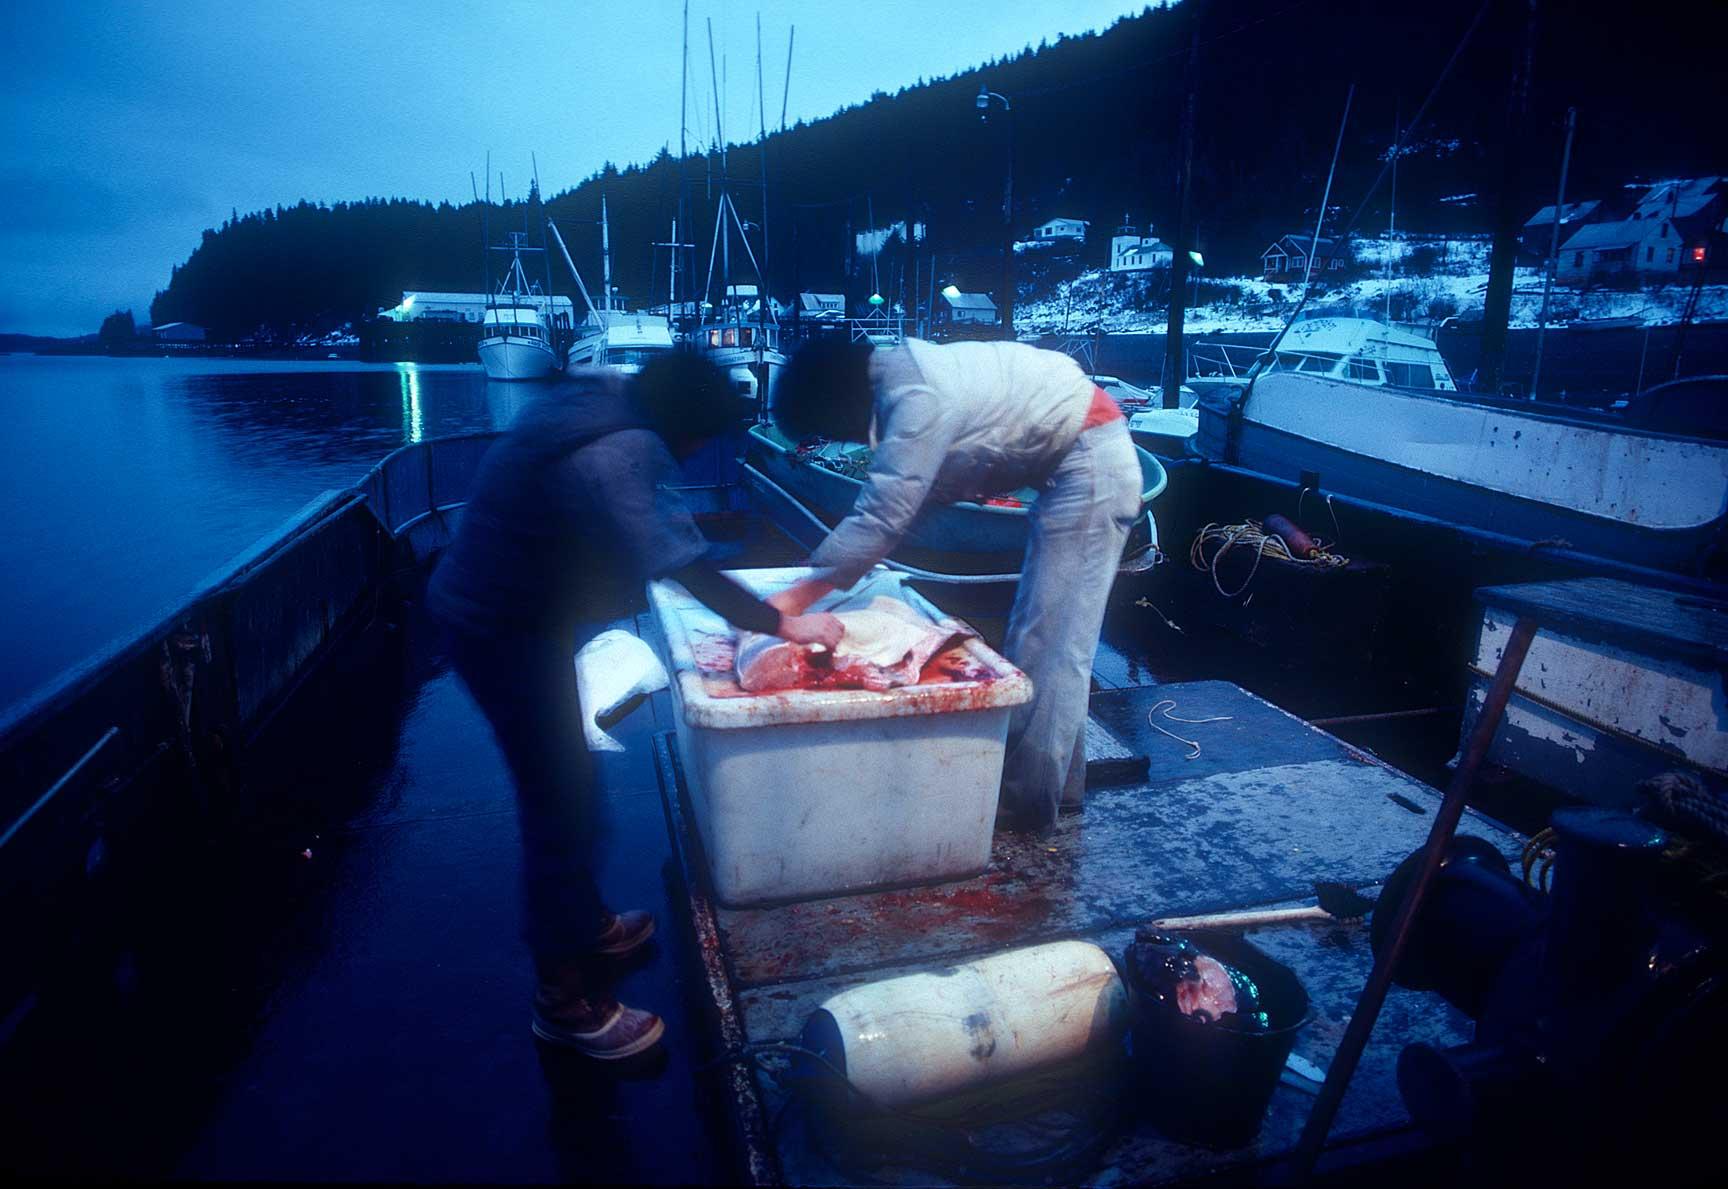 Hoonah, Alaska 1981